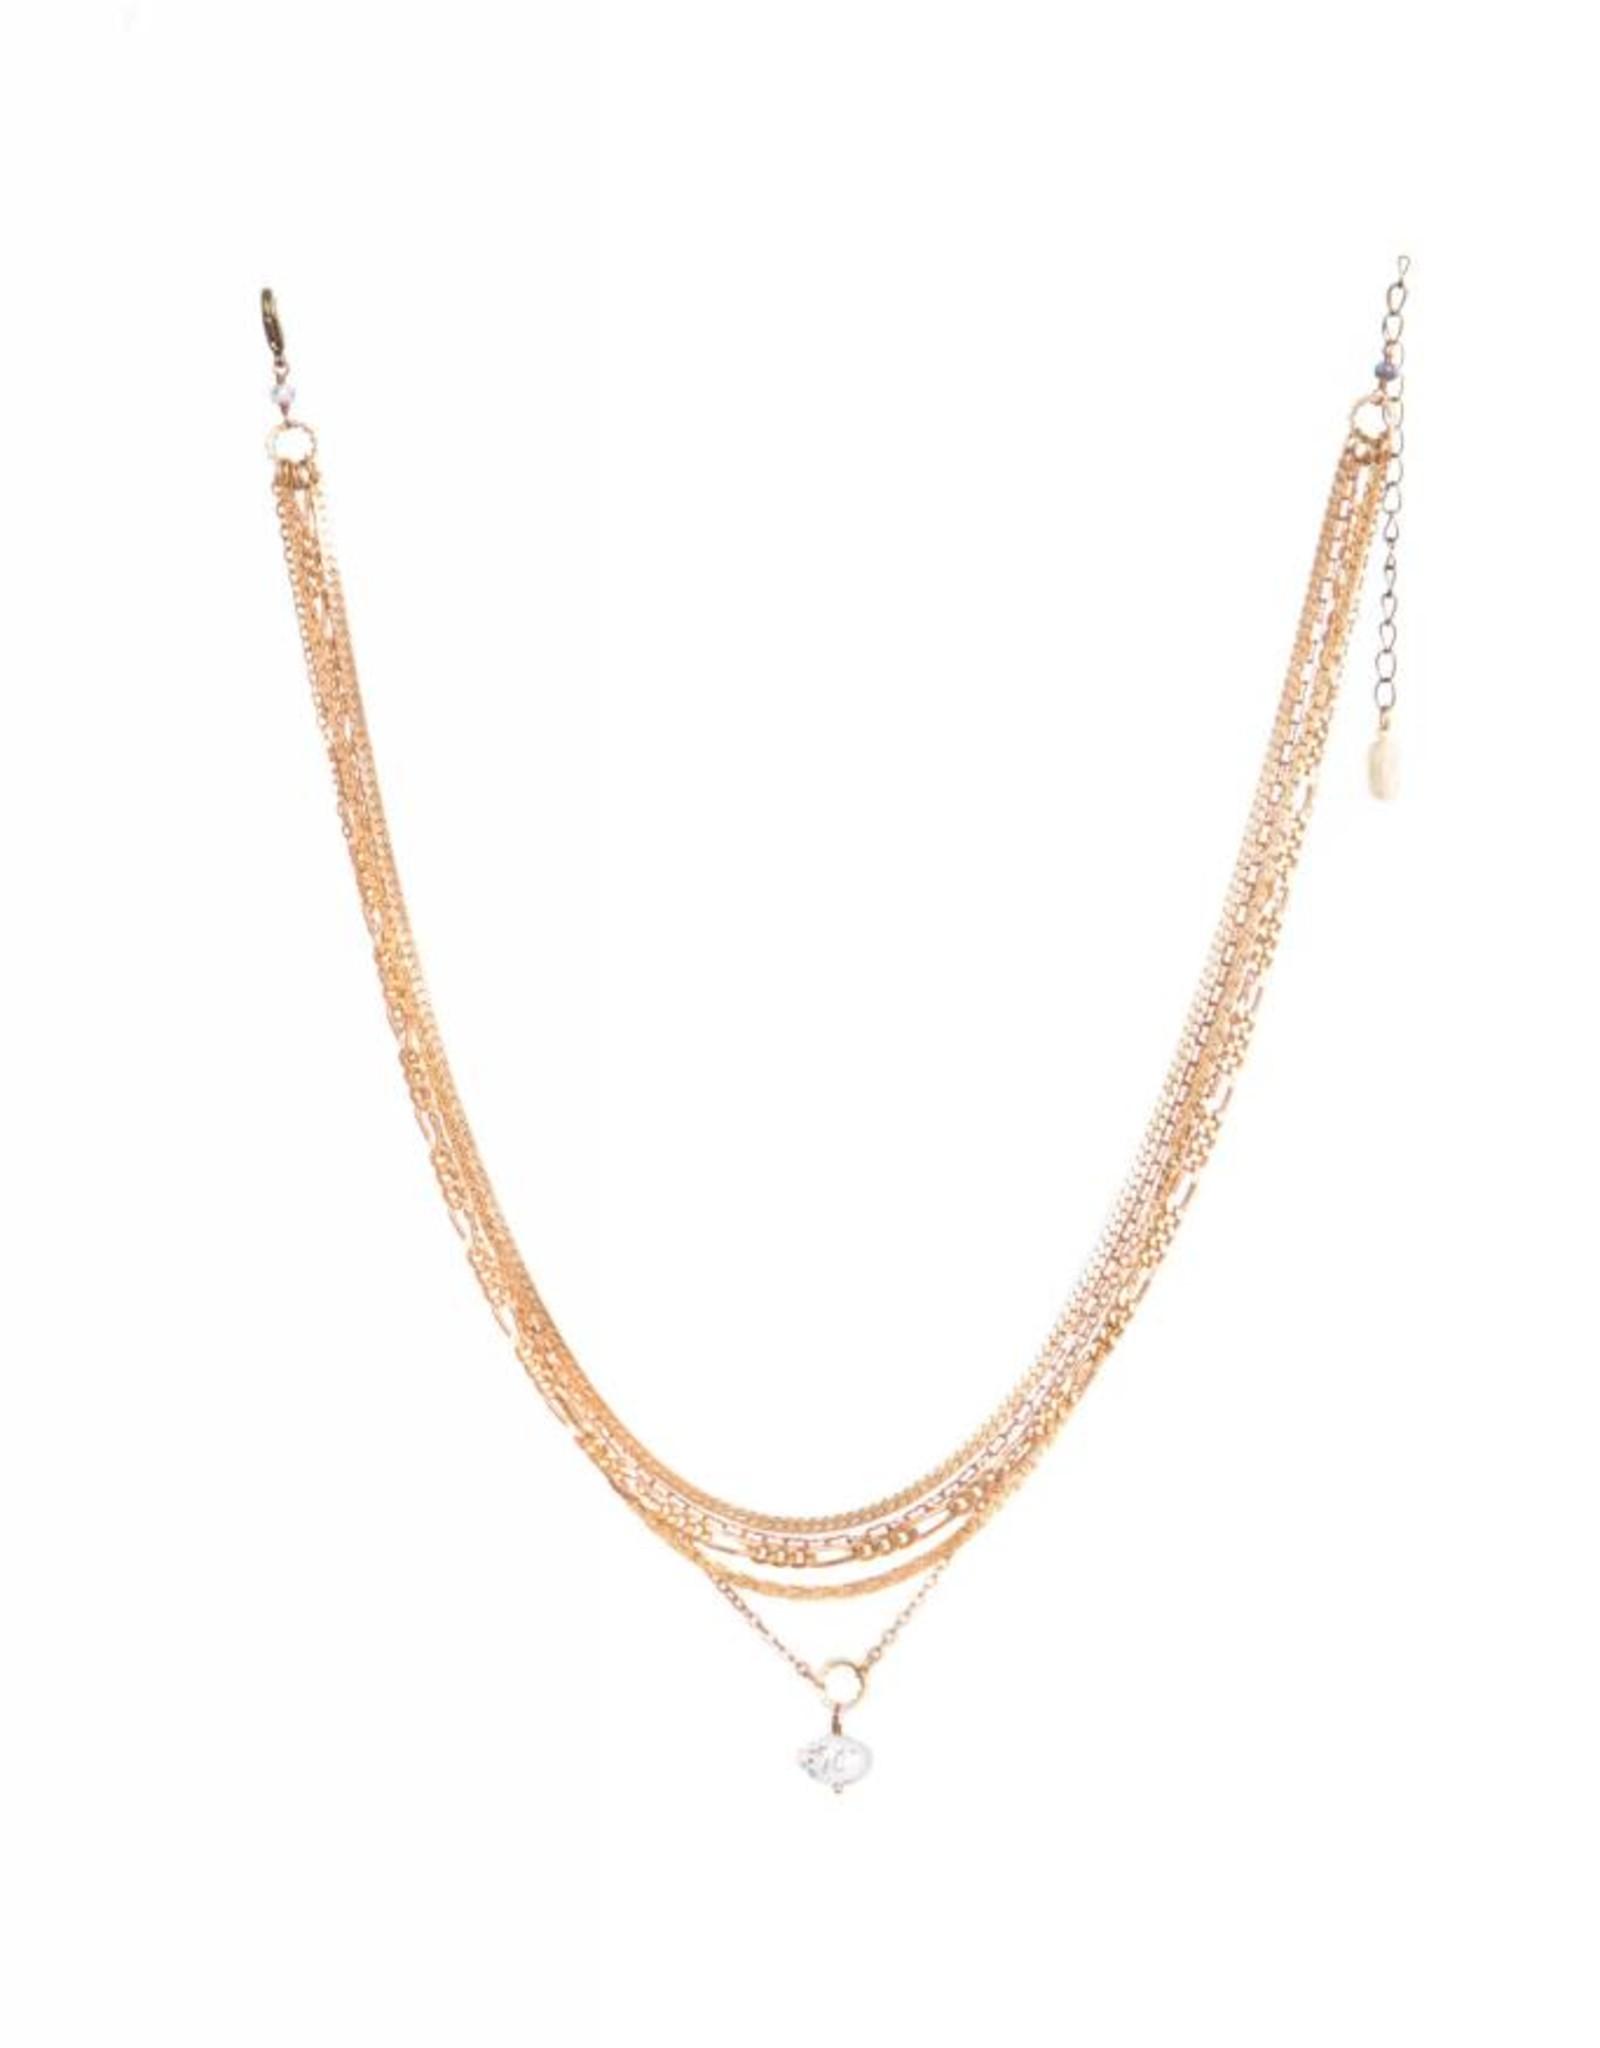 Hailey Gerrits Designs Gaia Necklace - Dendrite Opal